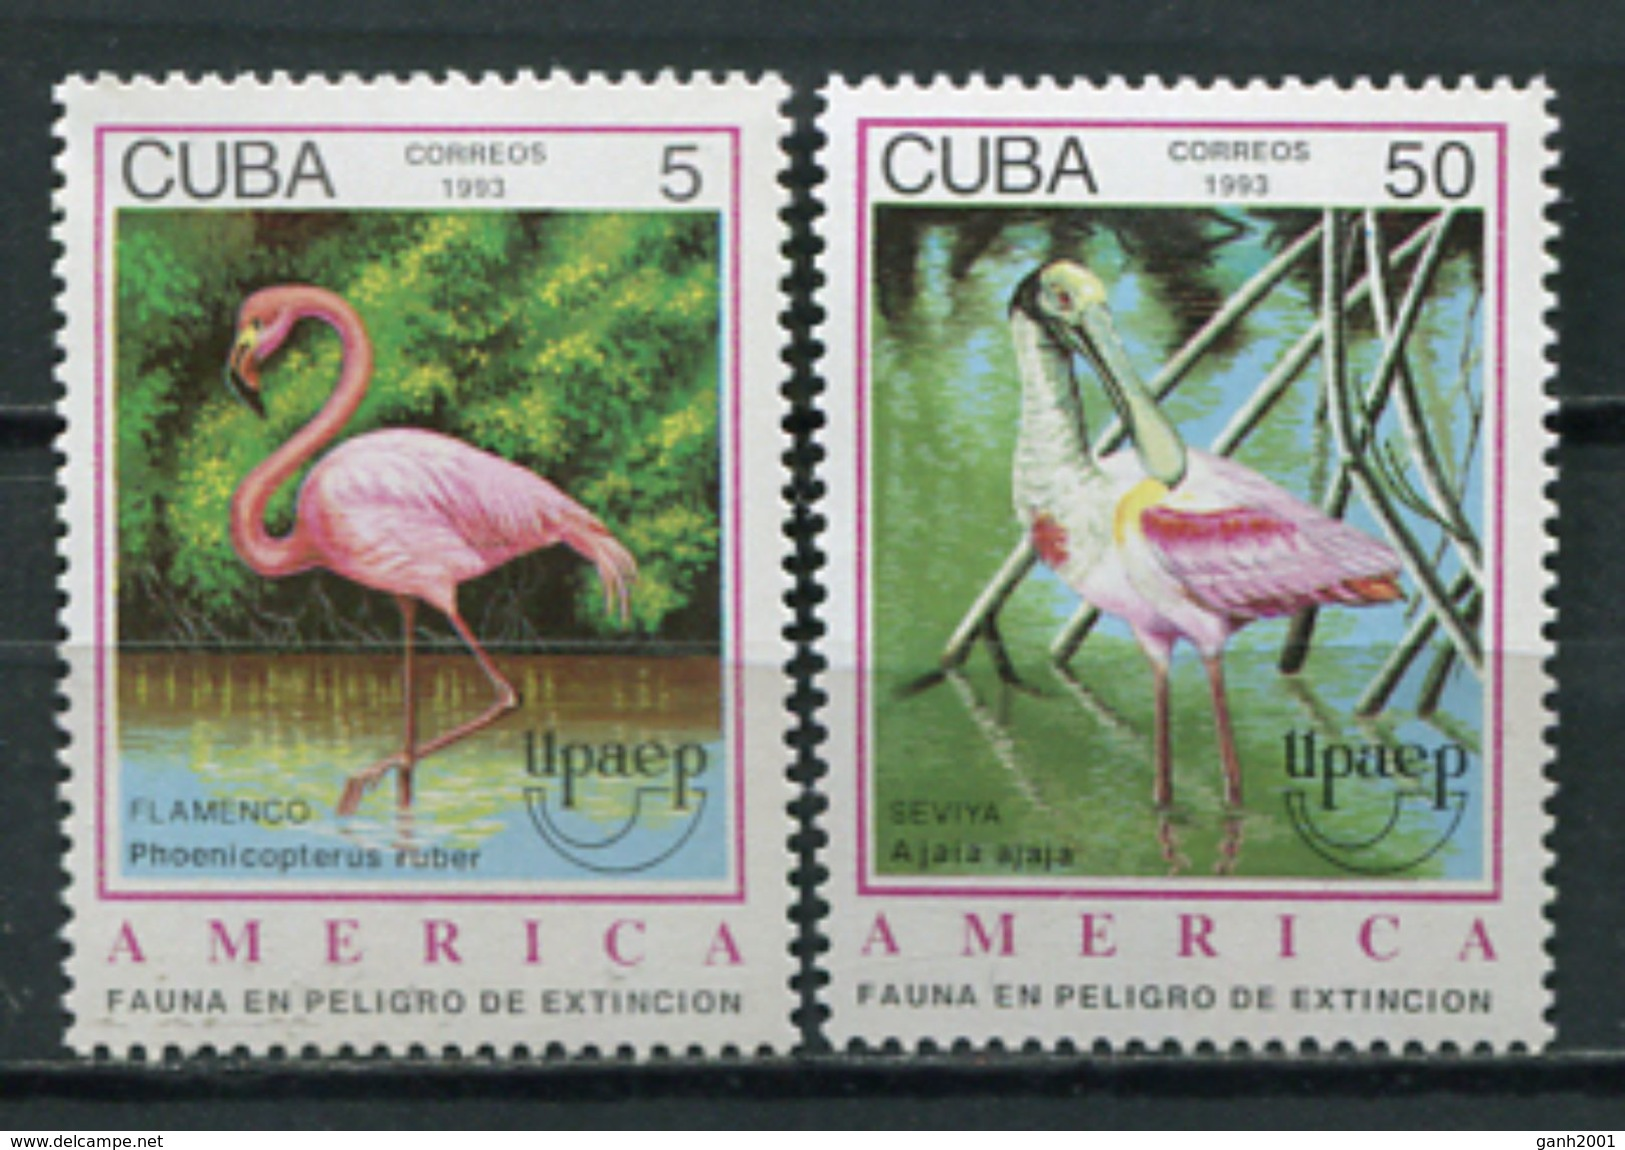 Cuba 1993 / Birds UPAEP MNH Aves Vögel Oiseaux / Cu5819  31 - Pájaros